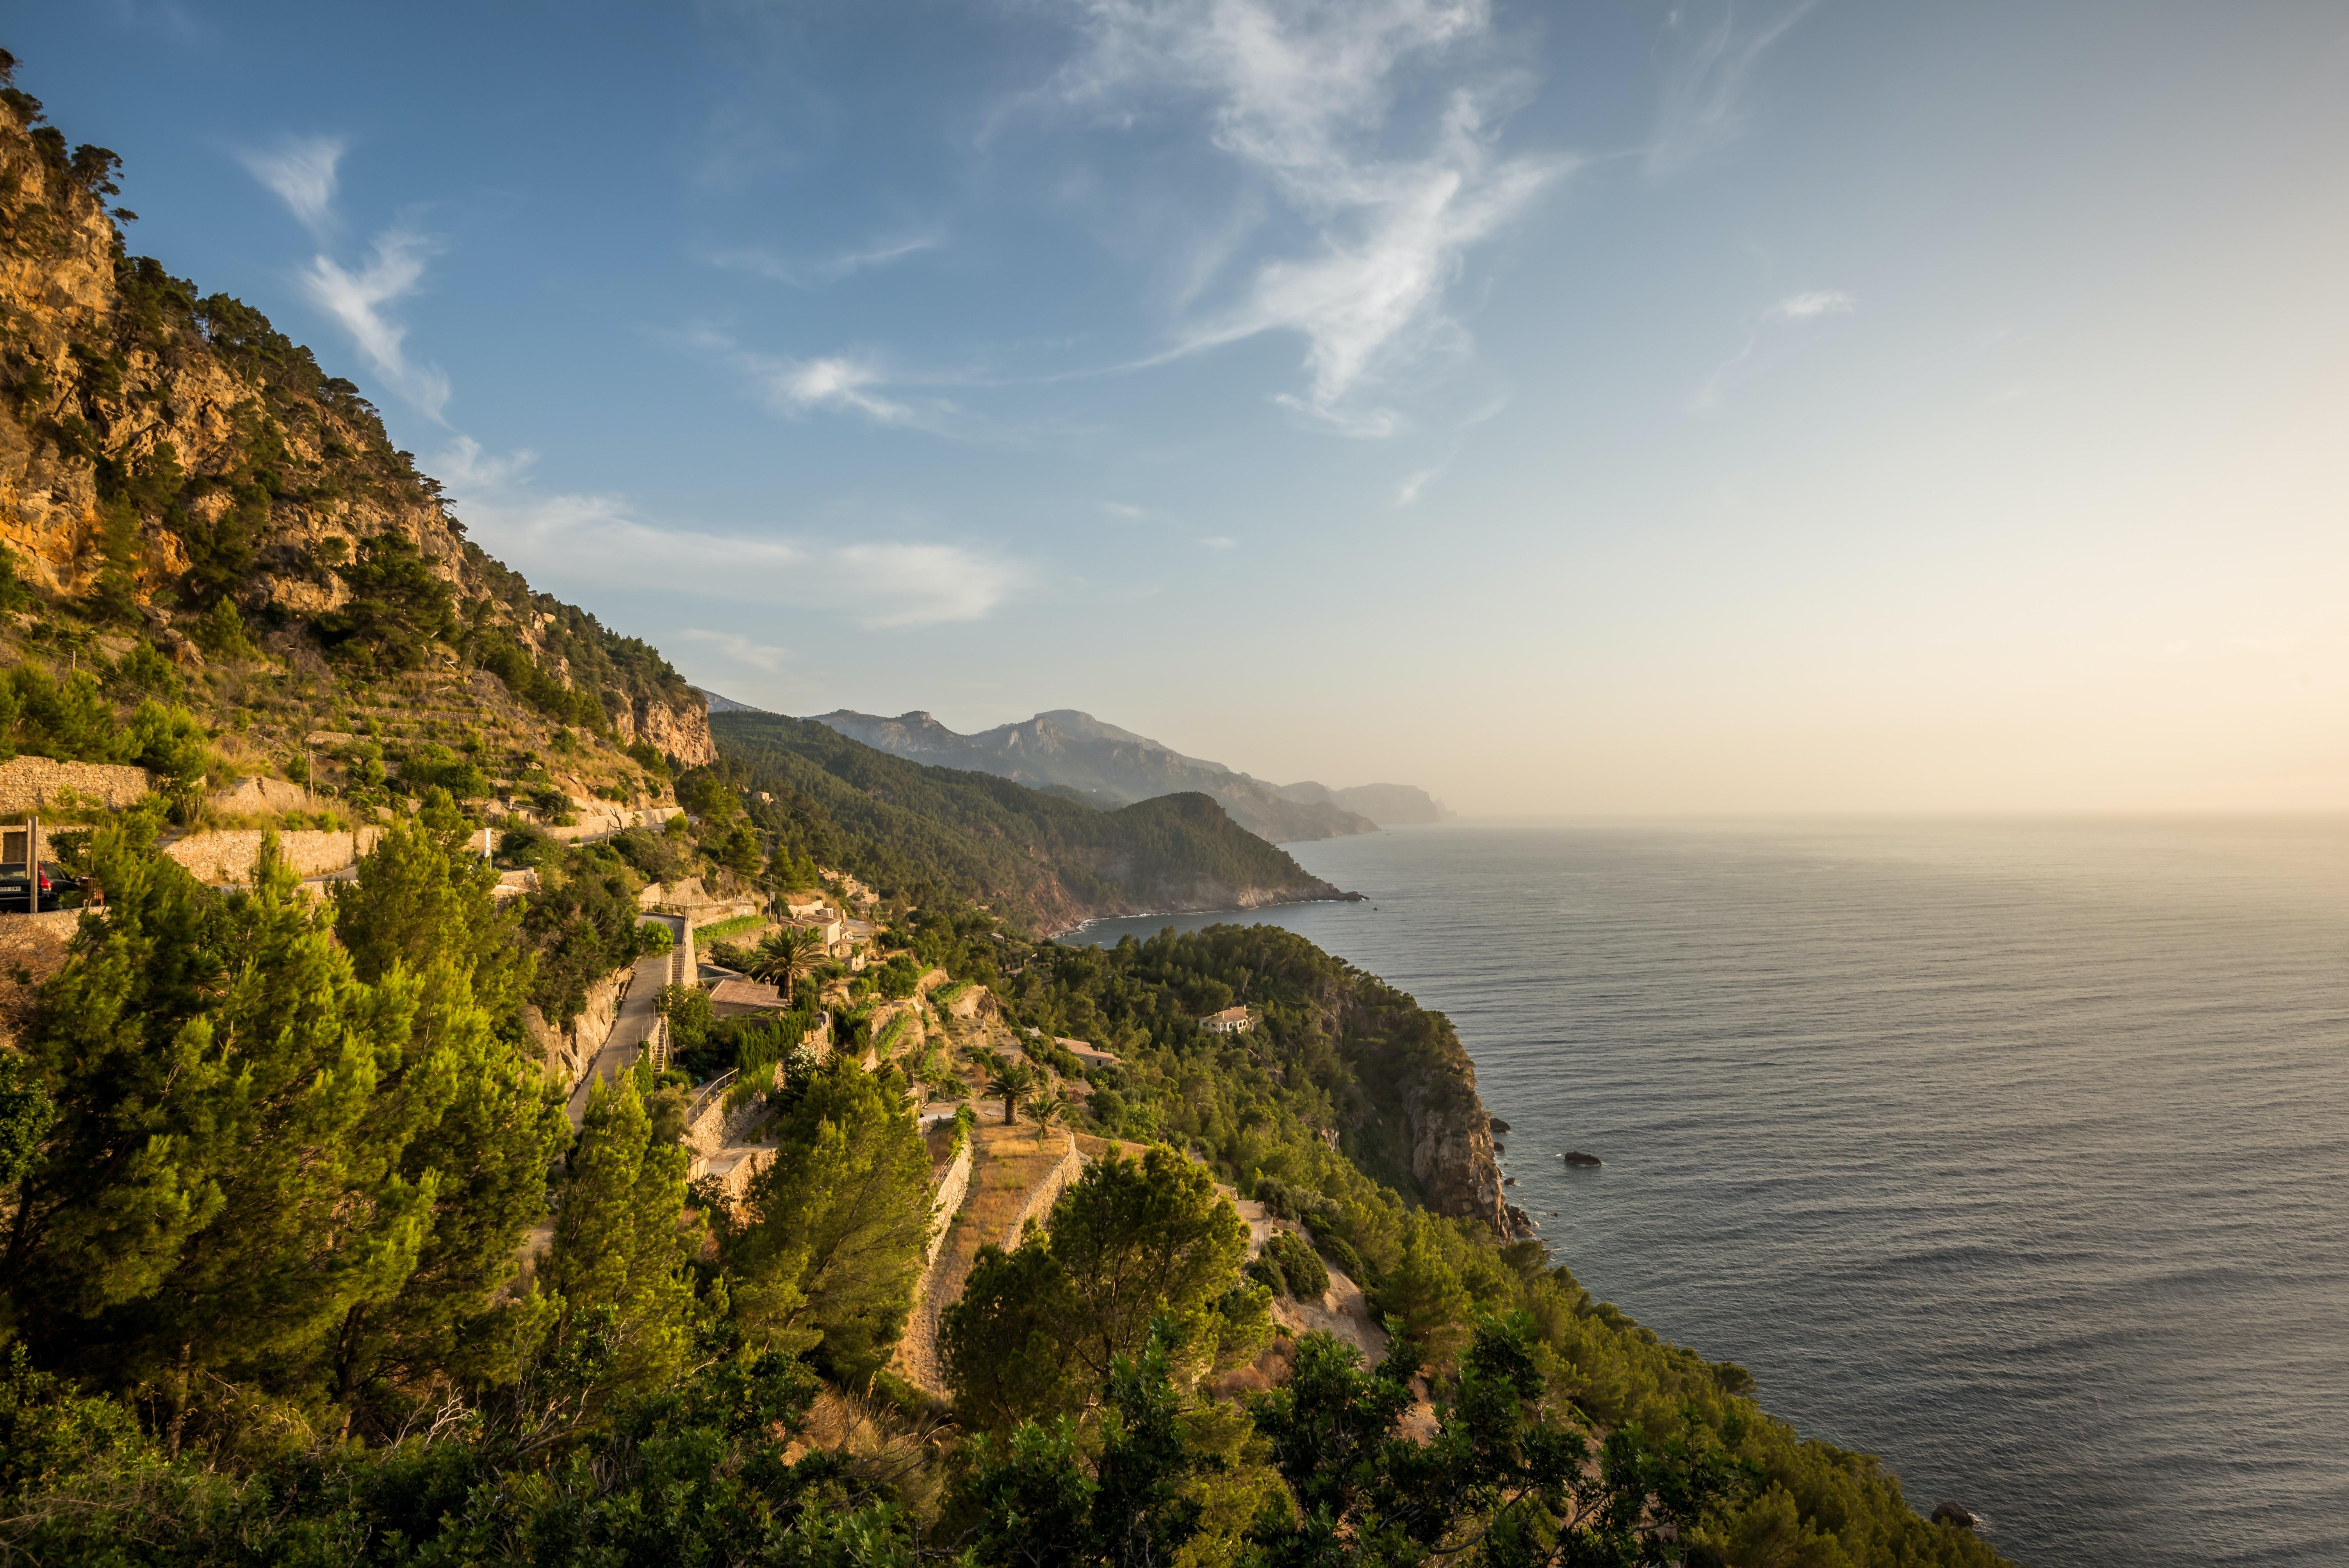 Mallorca, Llubí, Spain, Awe-inspiring landscapes